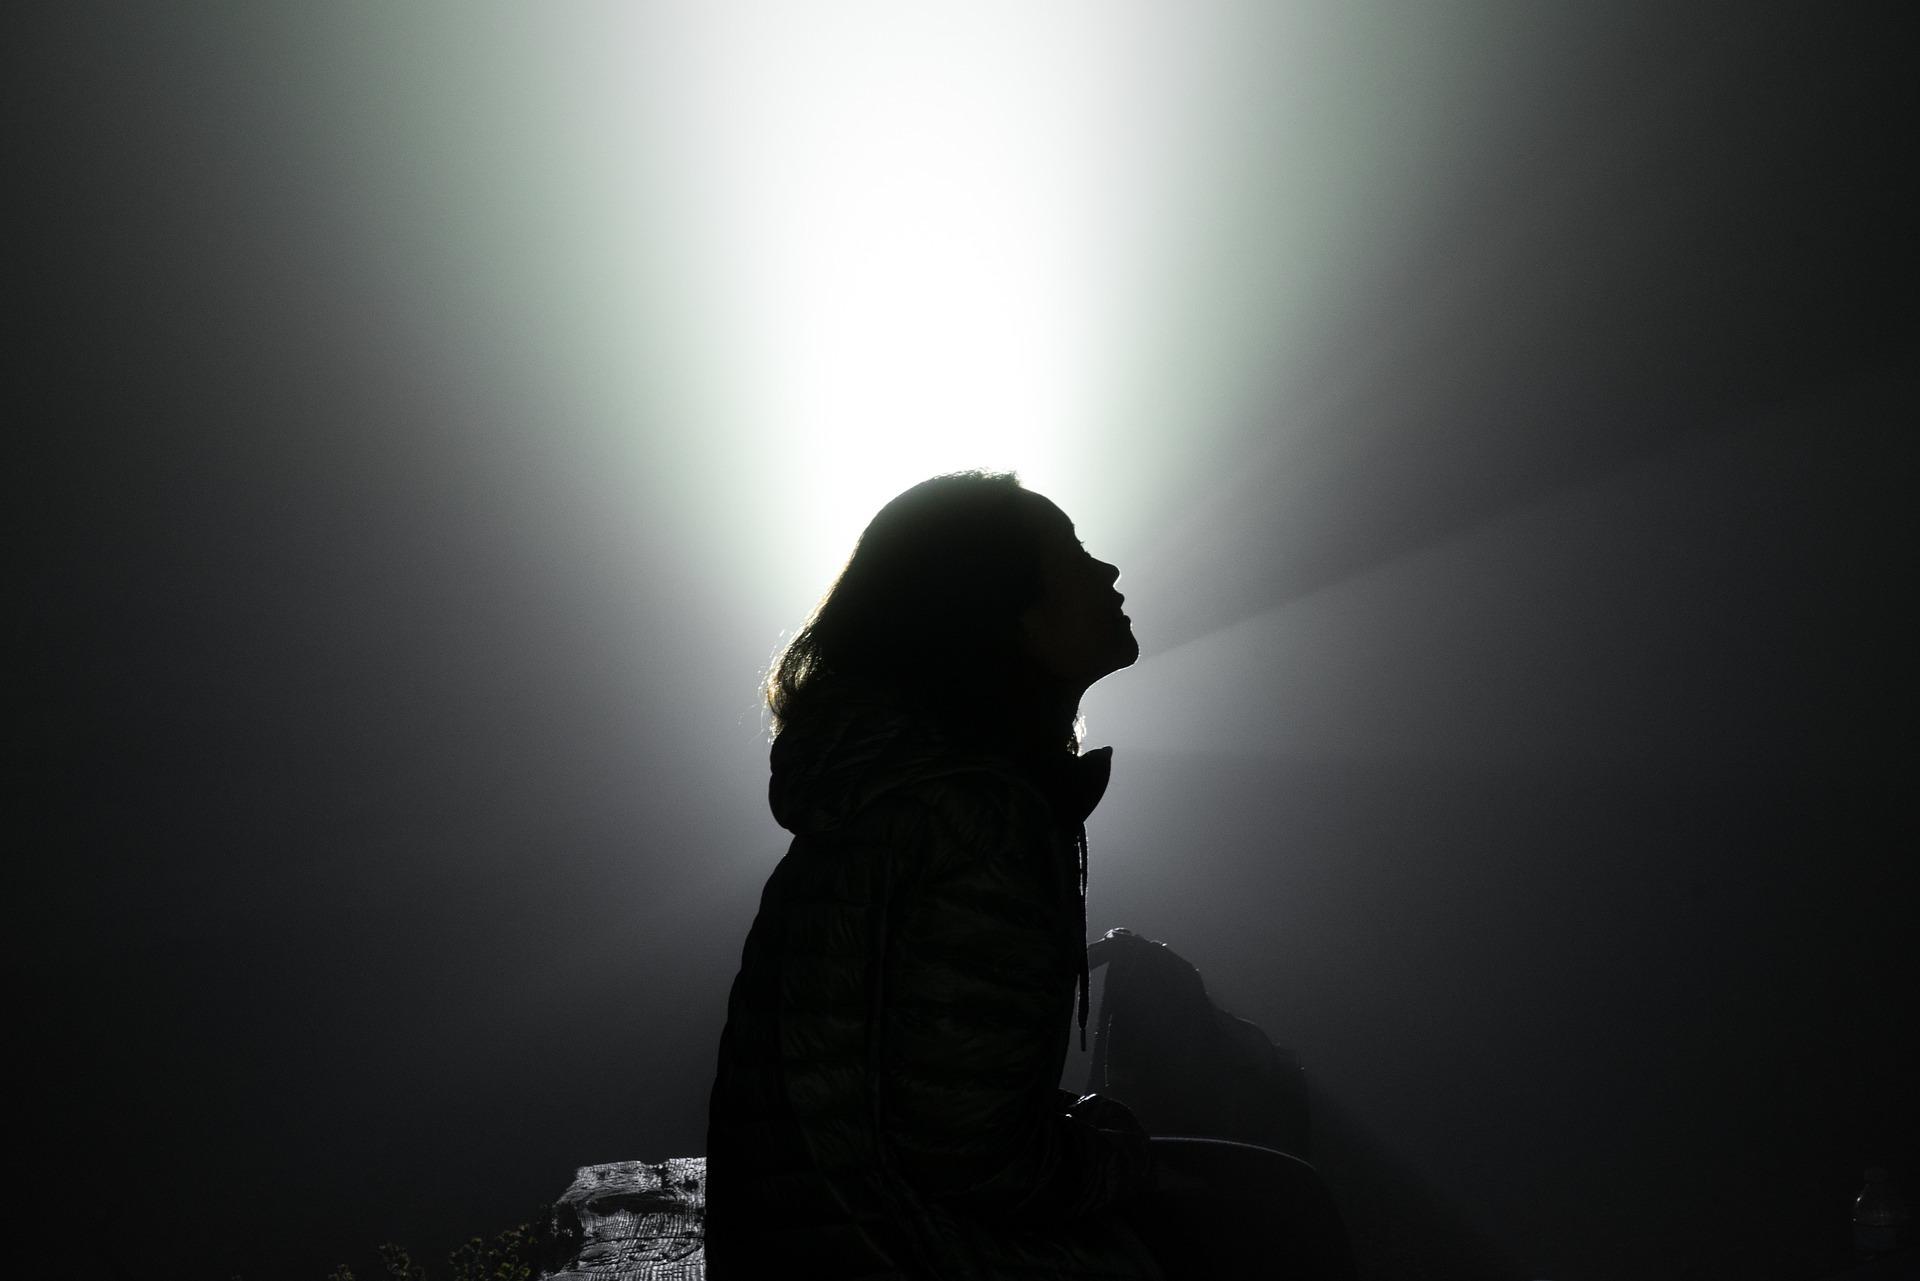 silhouette-2606648_1920